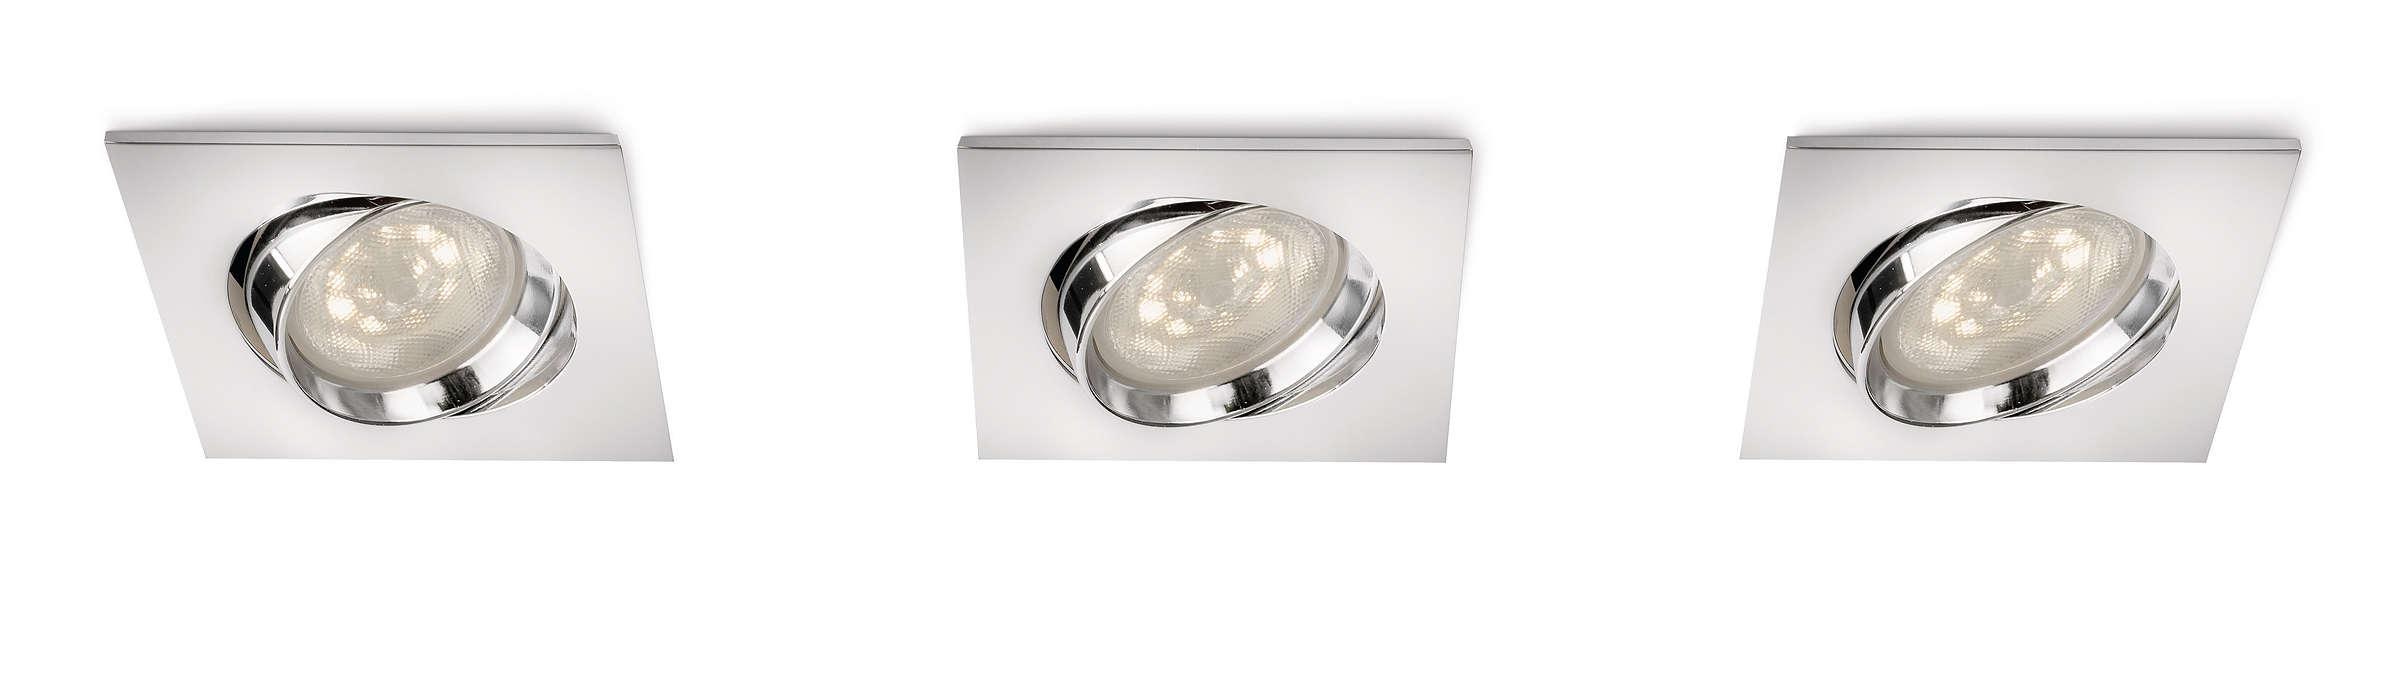 Fremhev hjemmet med lys